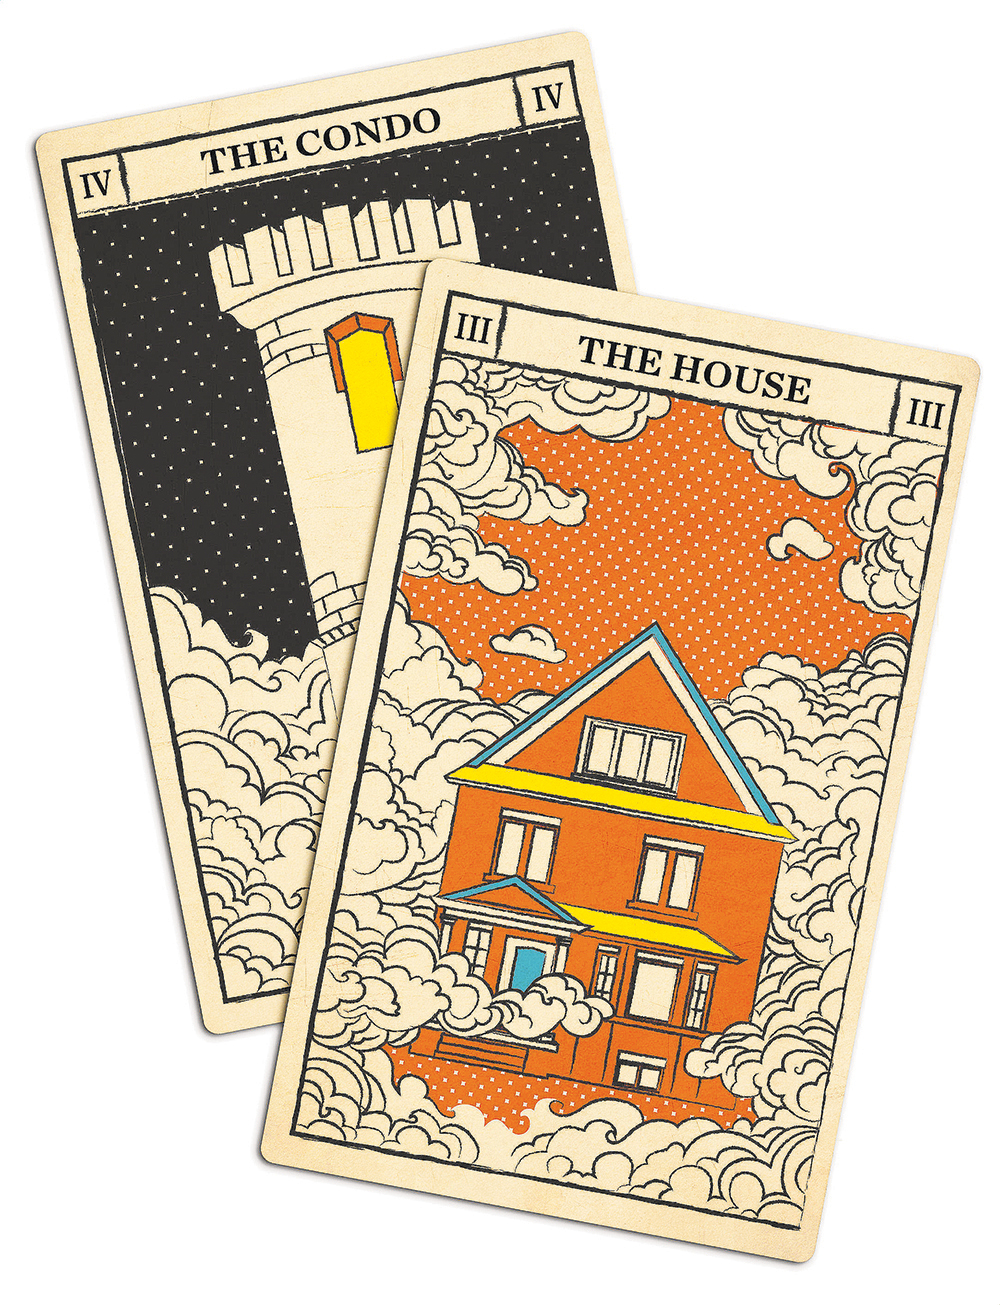 star-moneyville-tarot-cards.jpg